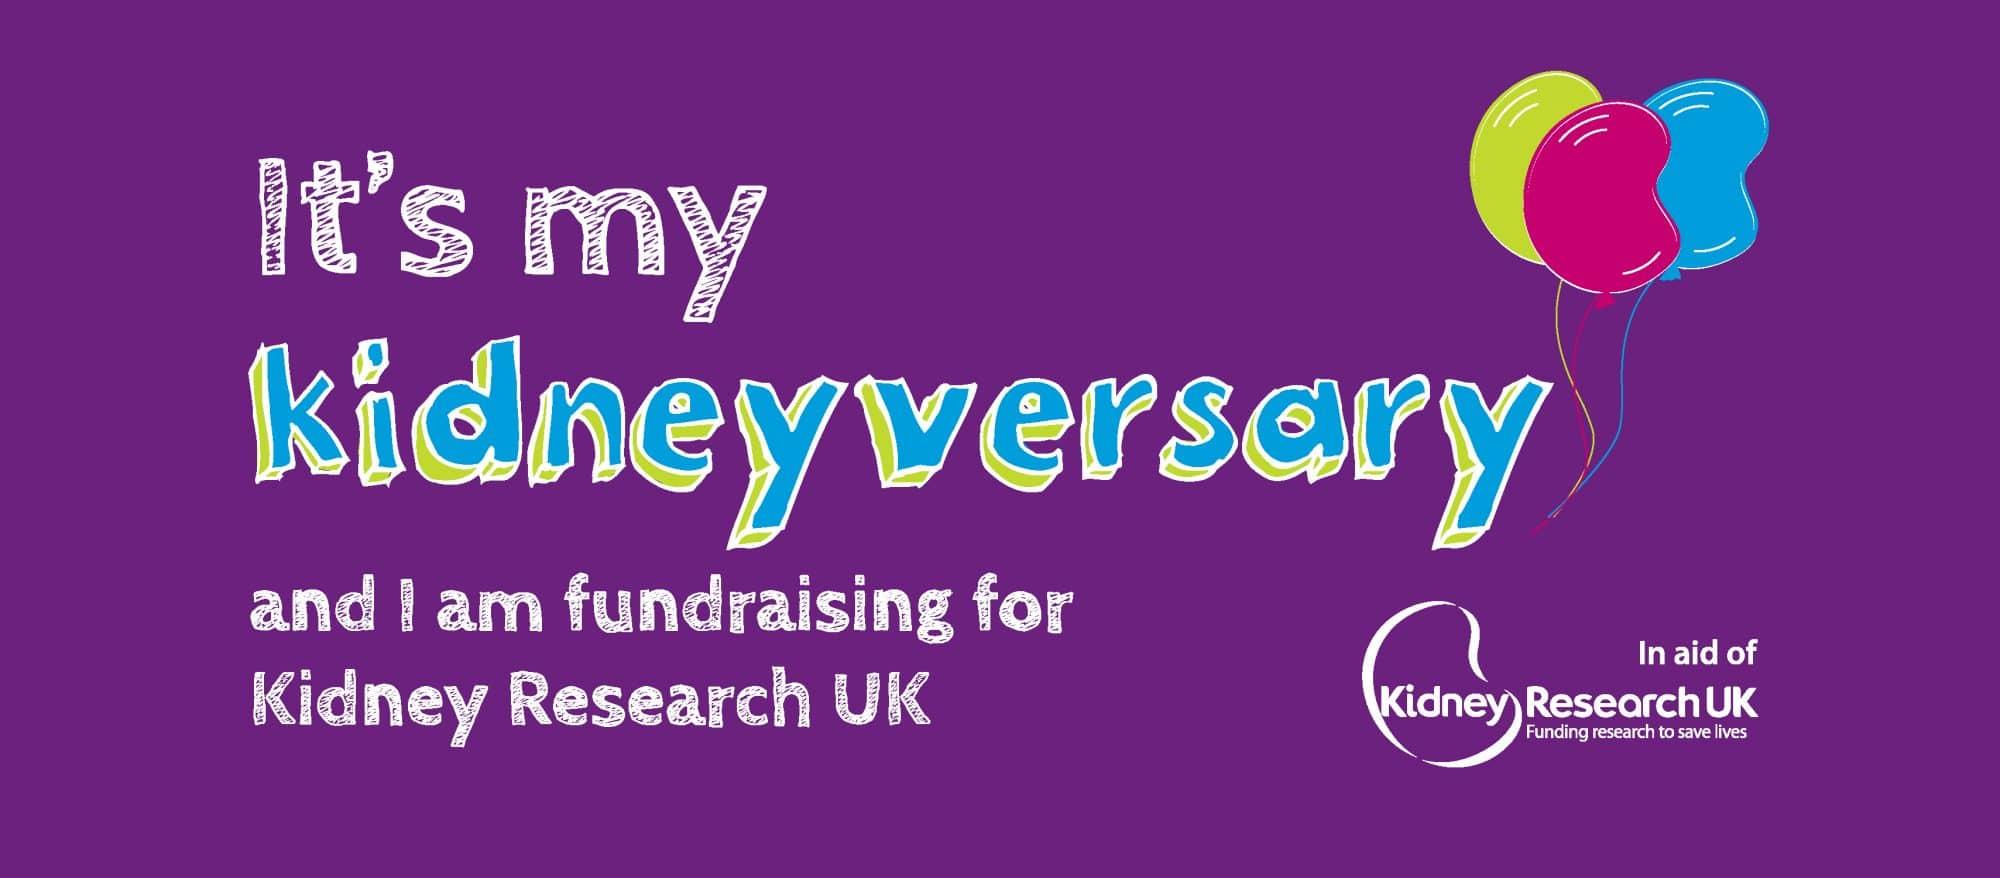 Kidneyversary cover image